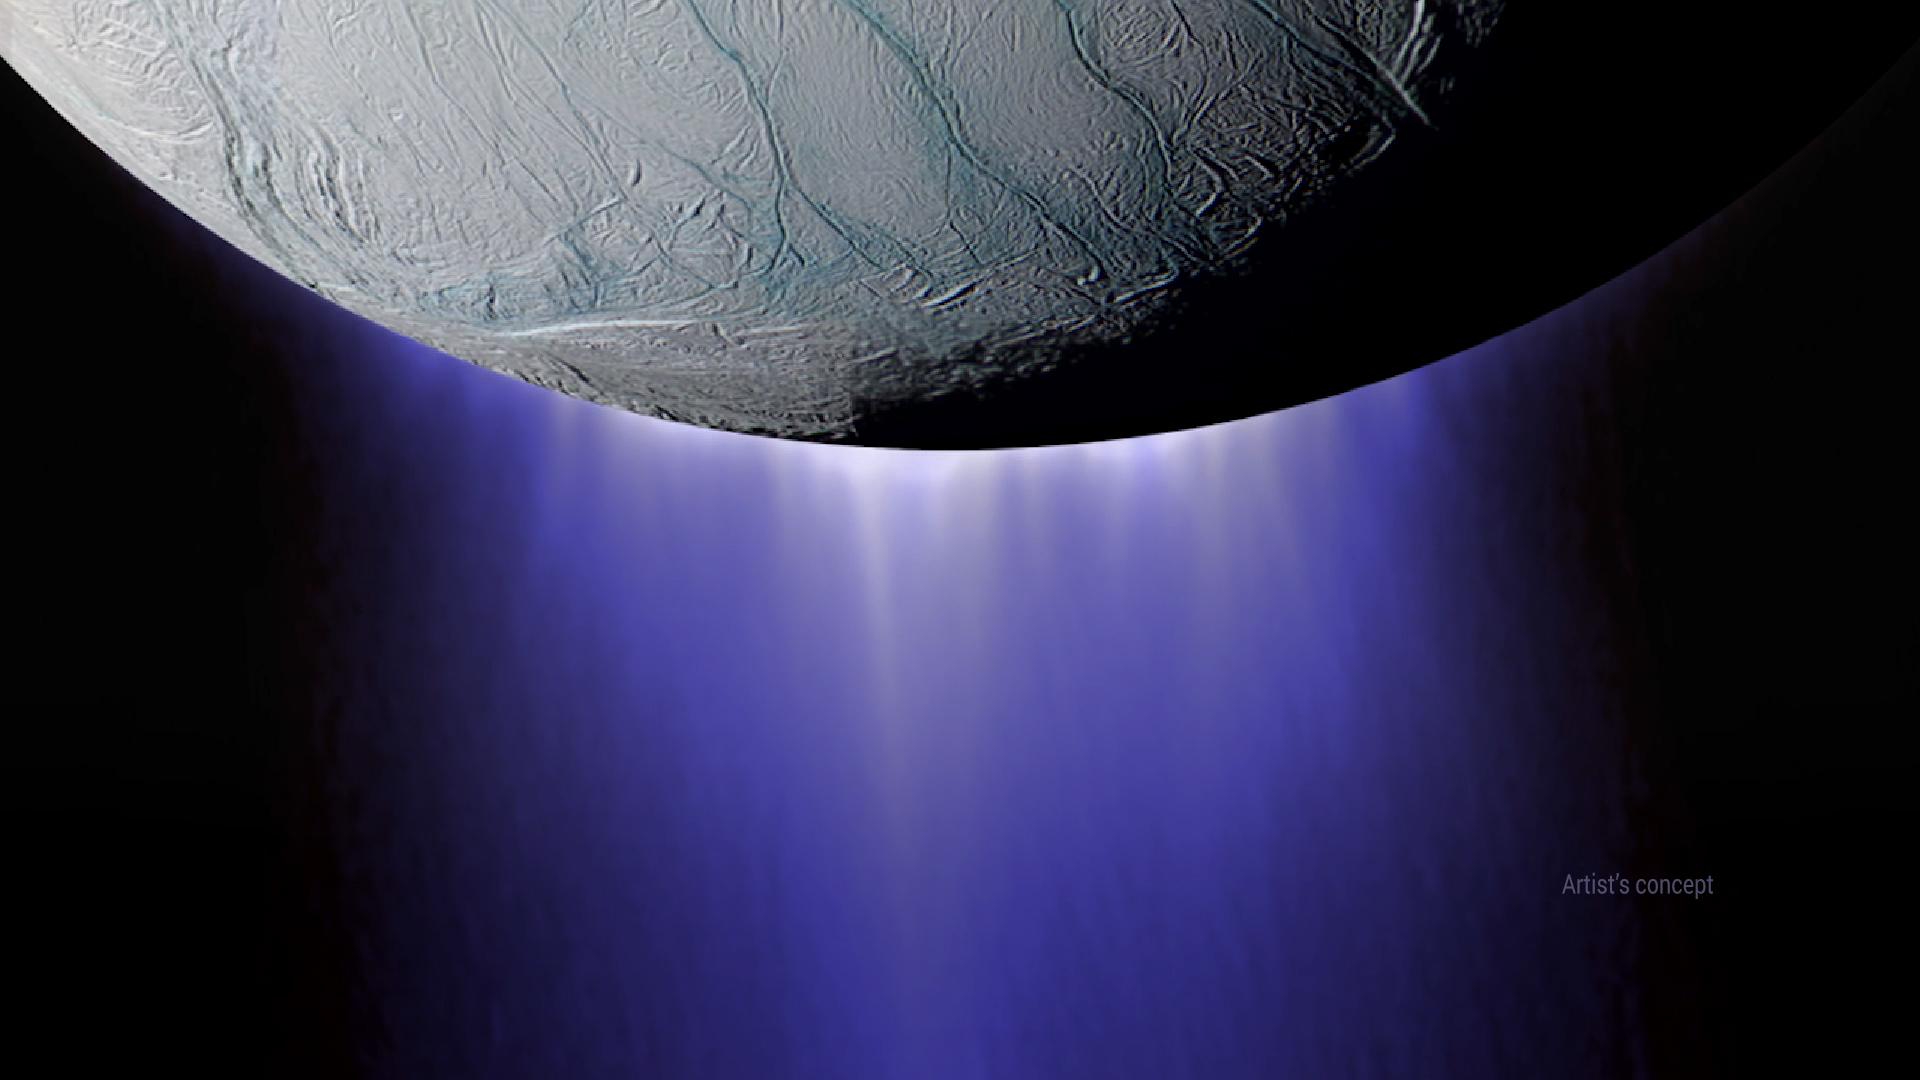 Images of Enceladus | 1920x1080